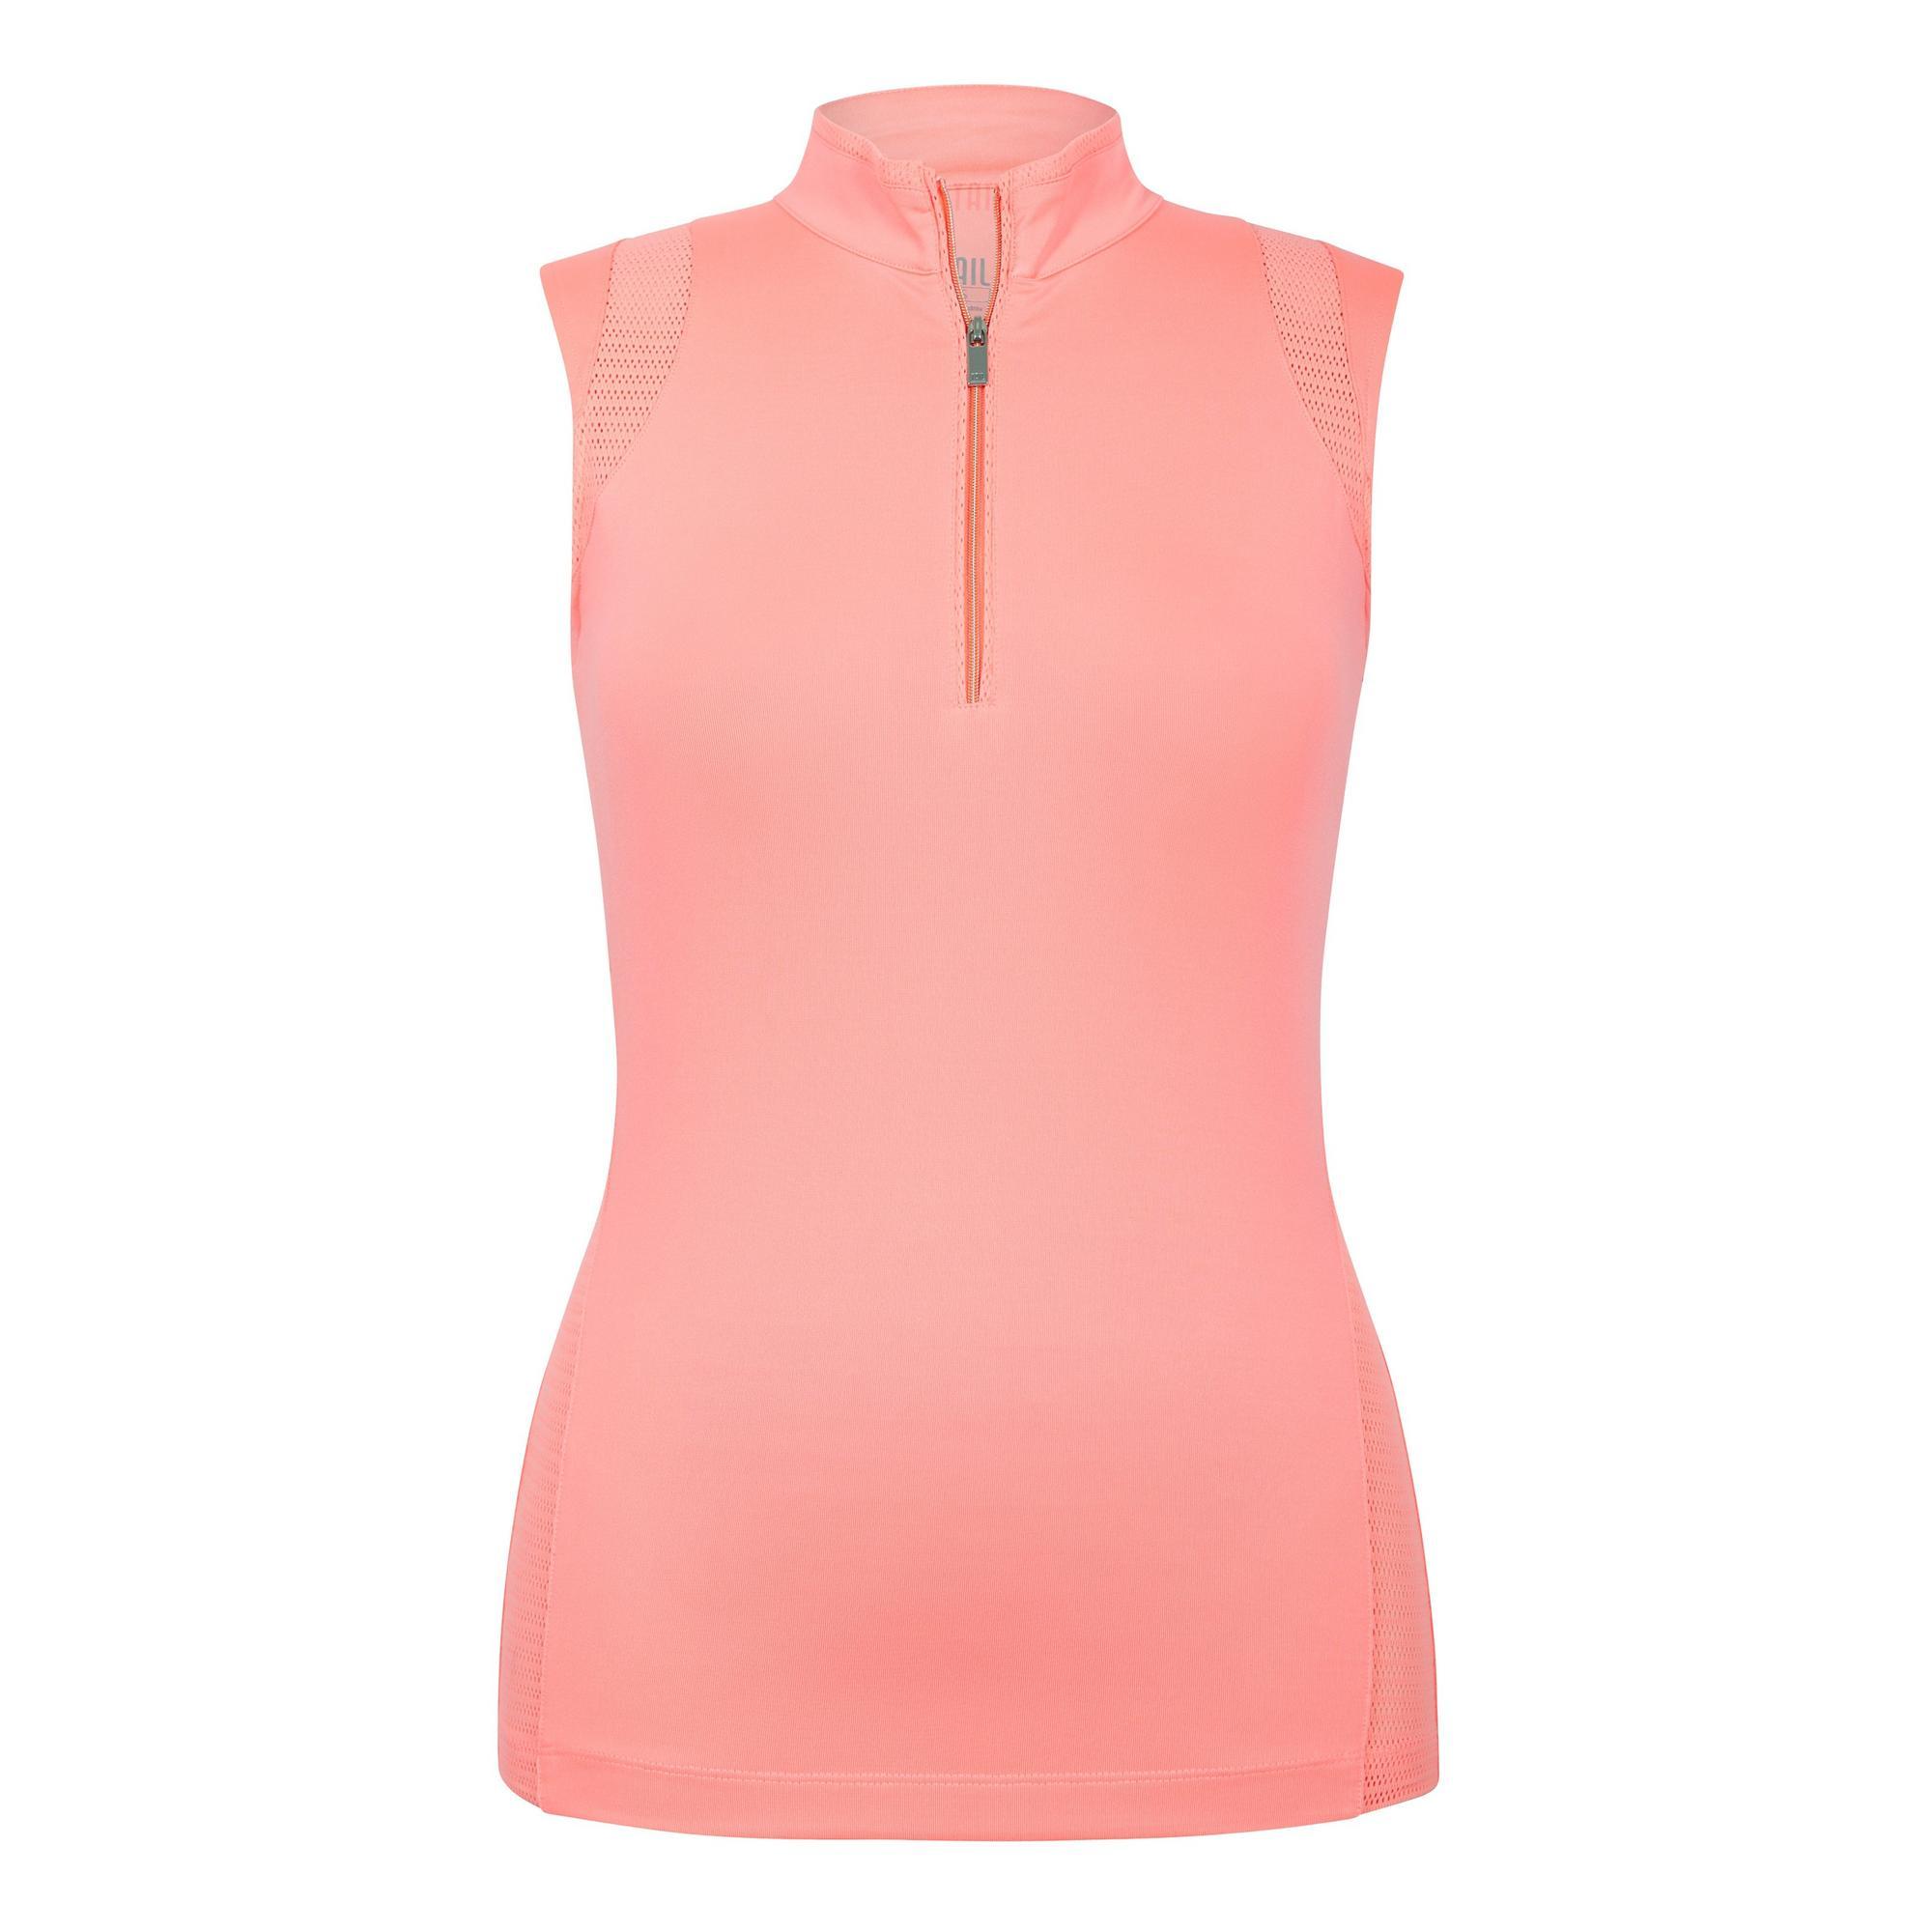 Women's Rori Sleeveless Solid Top